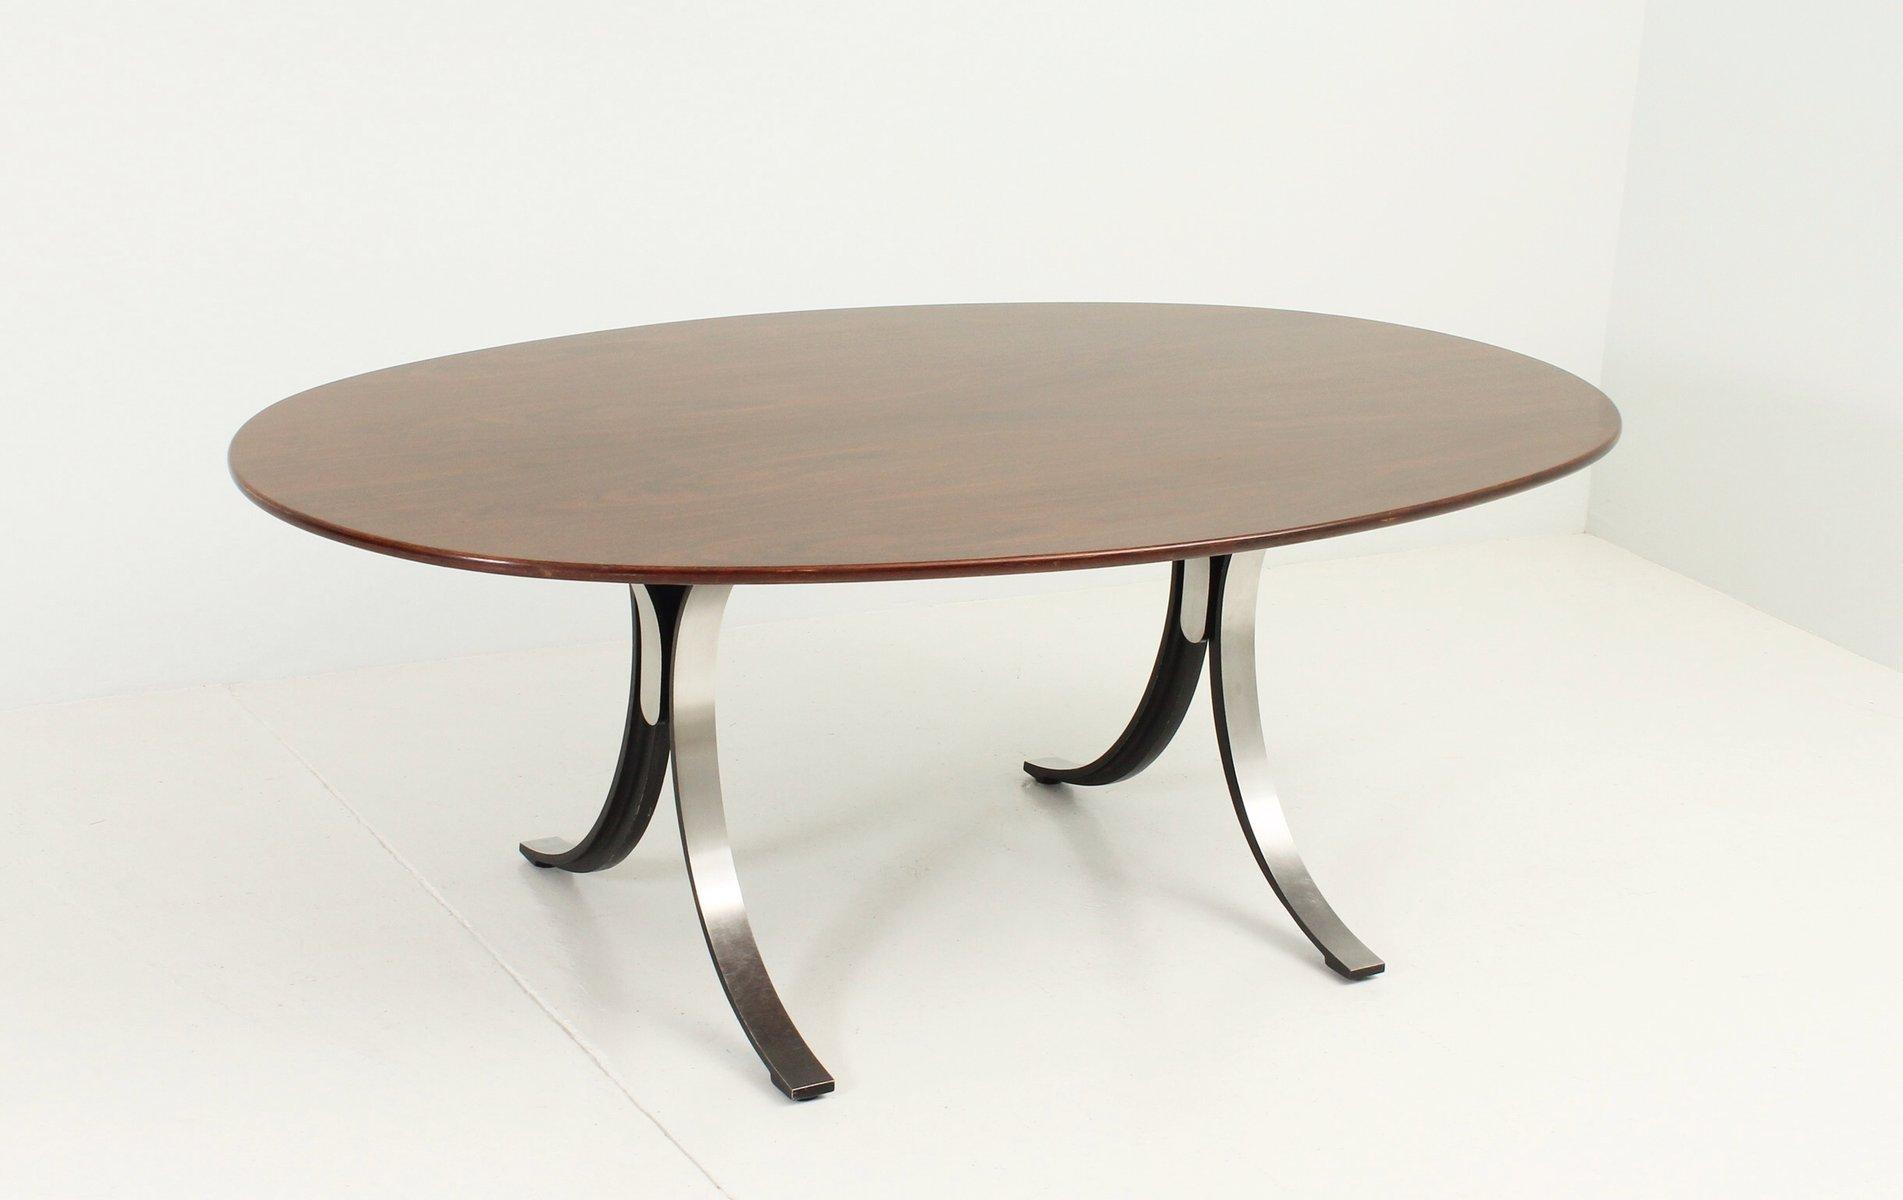 ta oval table by osvaldo borsani  eugenio gerli for tecno  - ta oval table by osvaldo borsani  eugenio gerli for tecno s